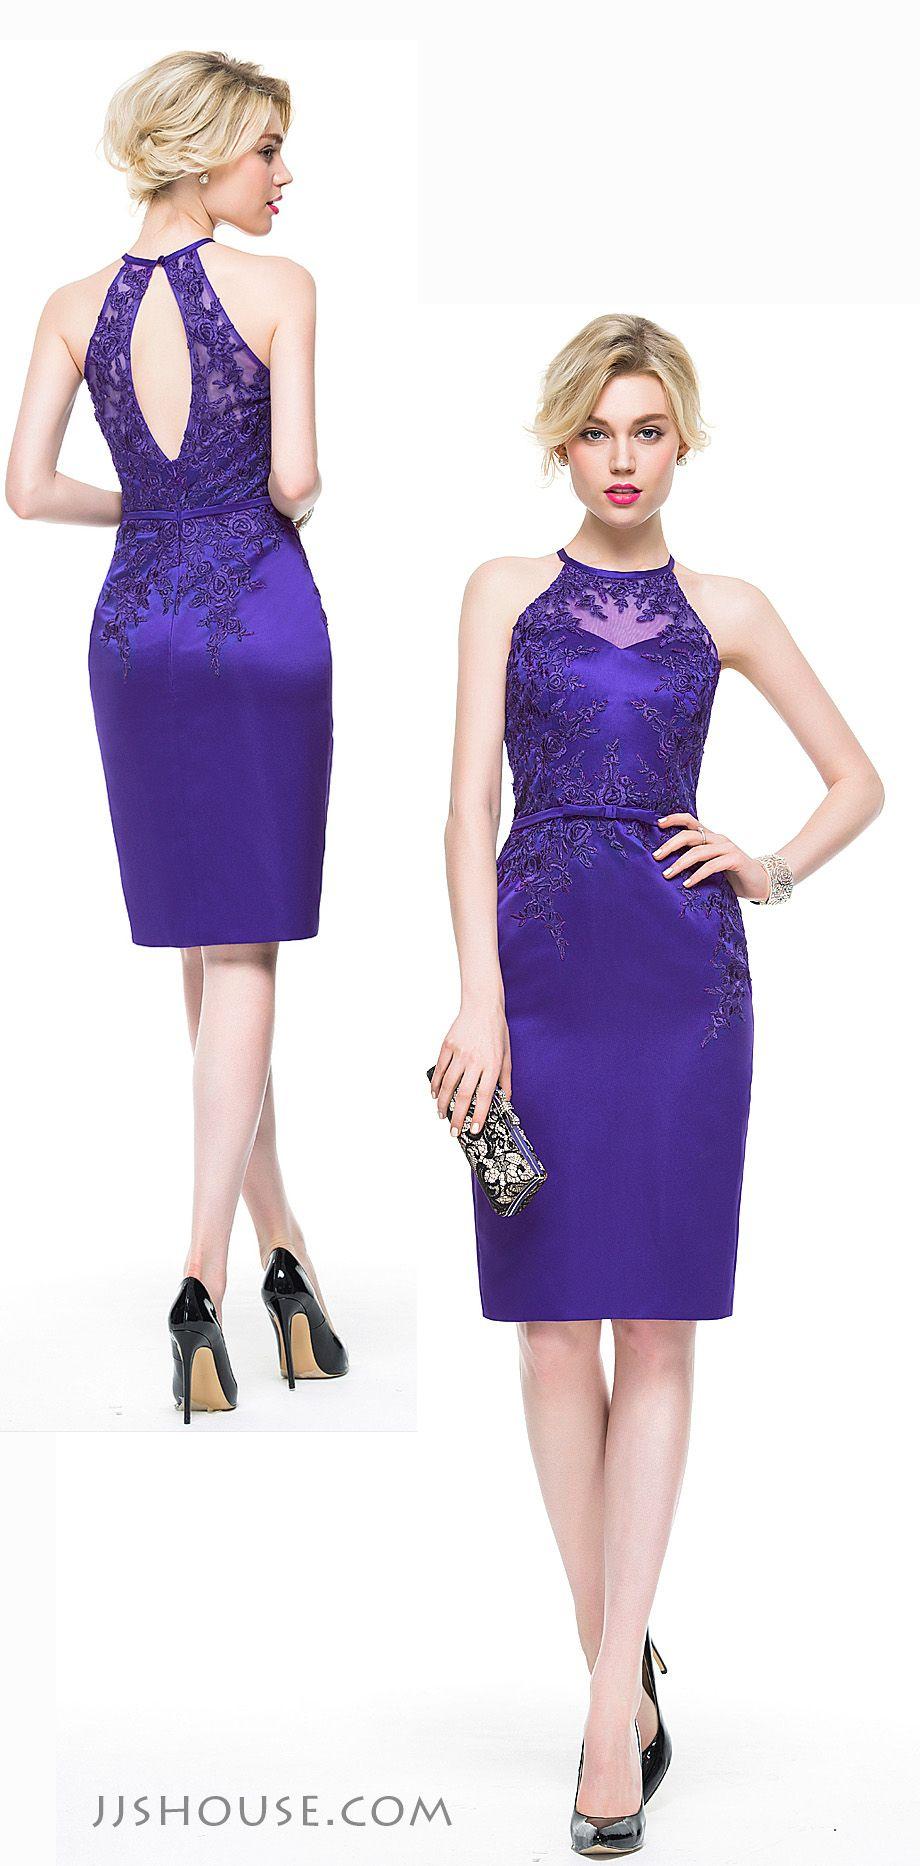 Sheath/Column Scoop Neck Knee-Length Satin Cocktail Dress With ...